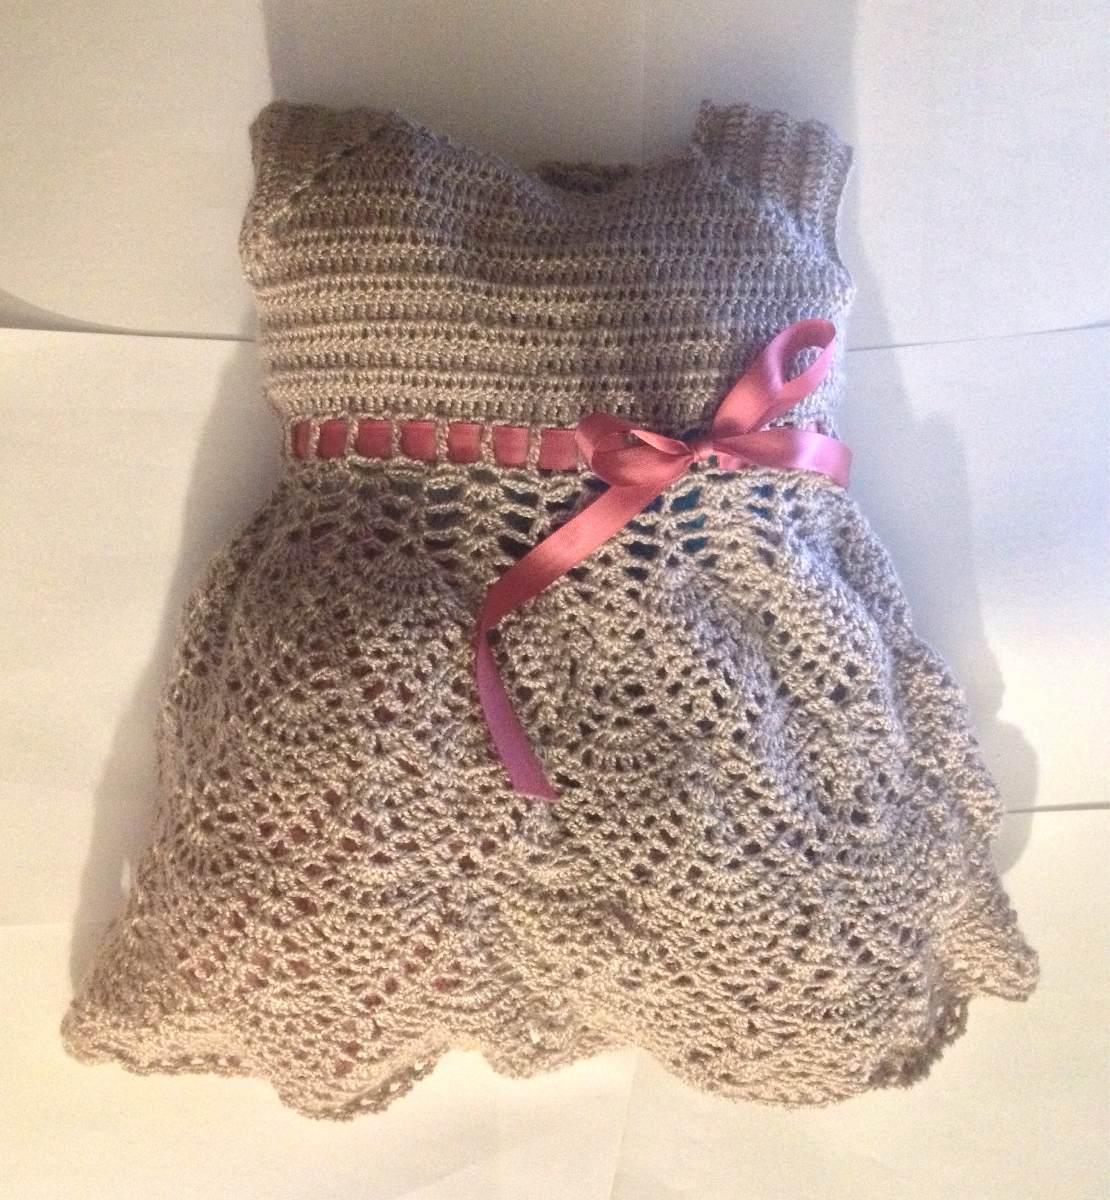 5696f131b Vestidos Tejido A Crochet P/niña Hasta 9 Meses - Bs. 4,50 en Mercado ...